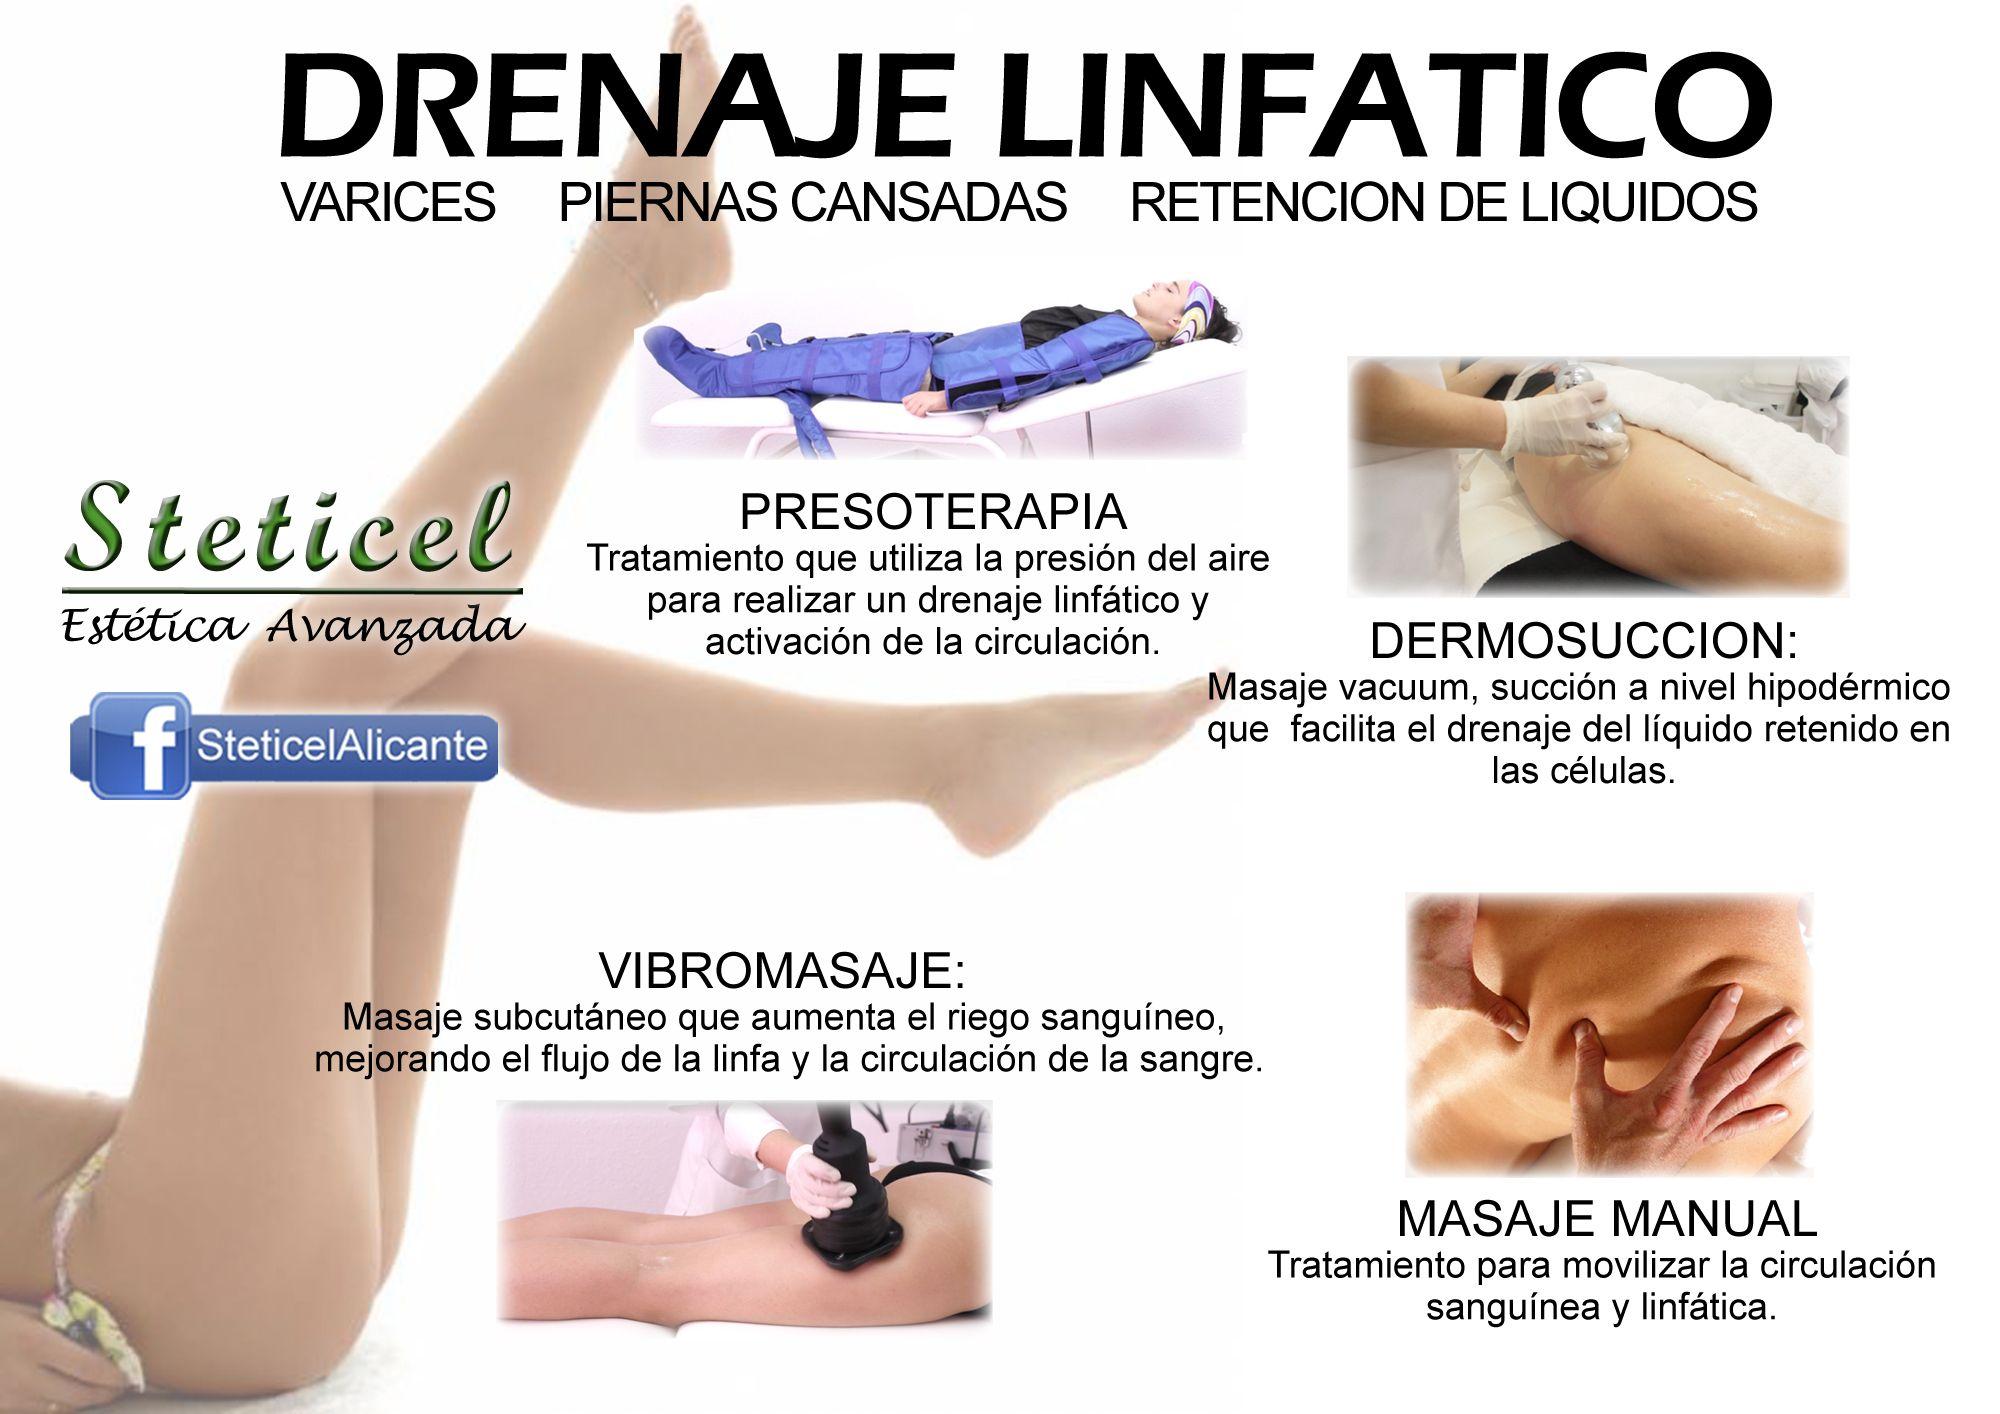 drenaje linfatico para adelgazar piernas